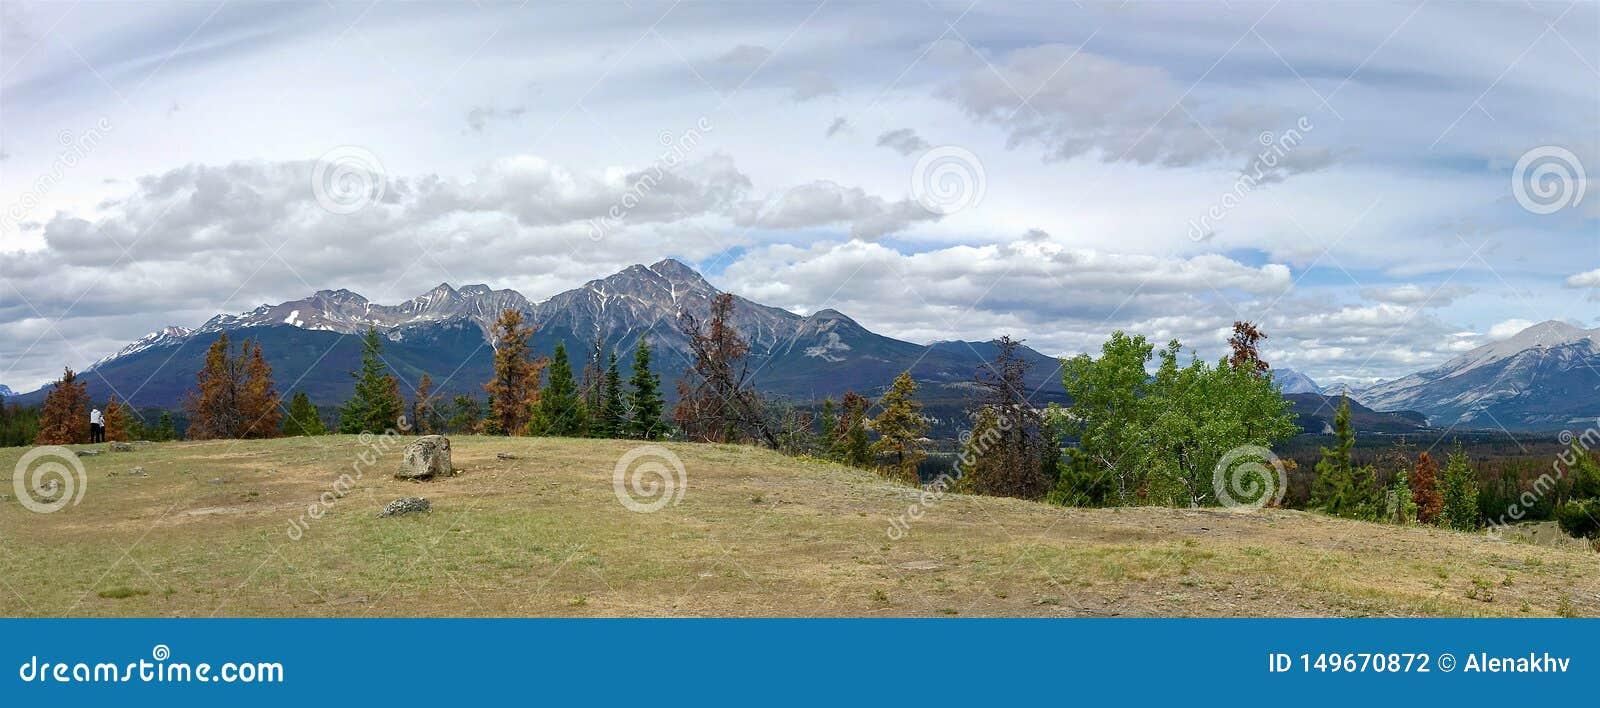 Panoramautsikt av de steniga bergen i Jasper National Park